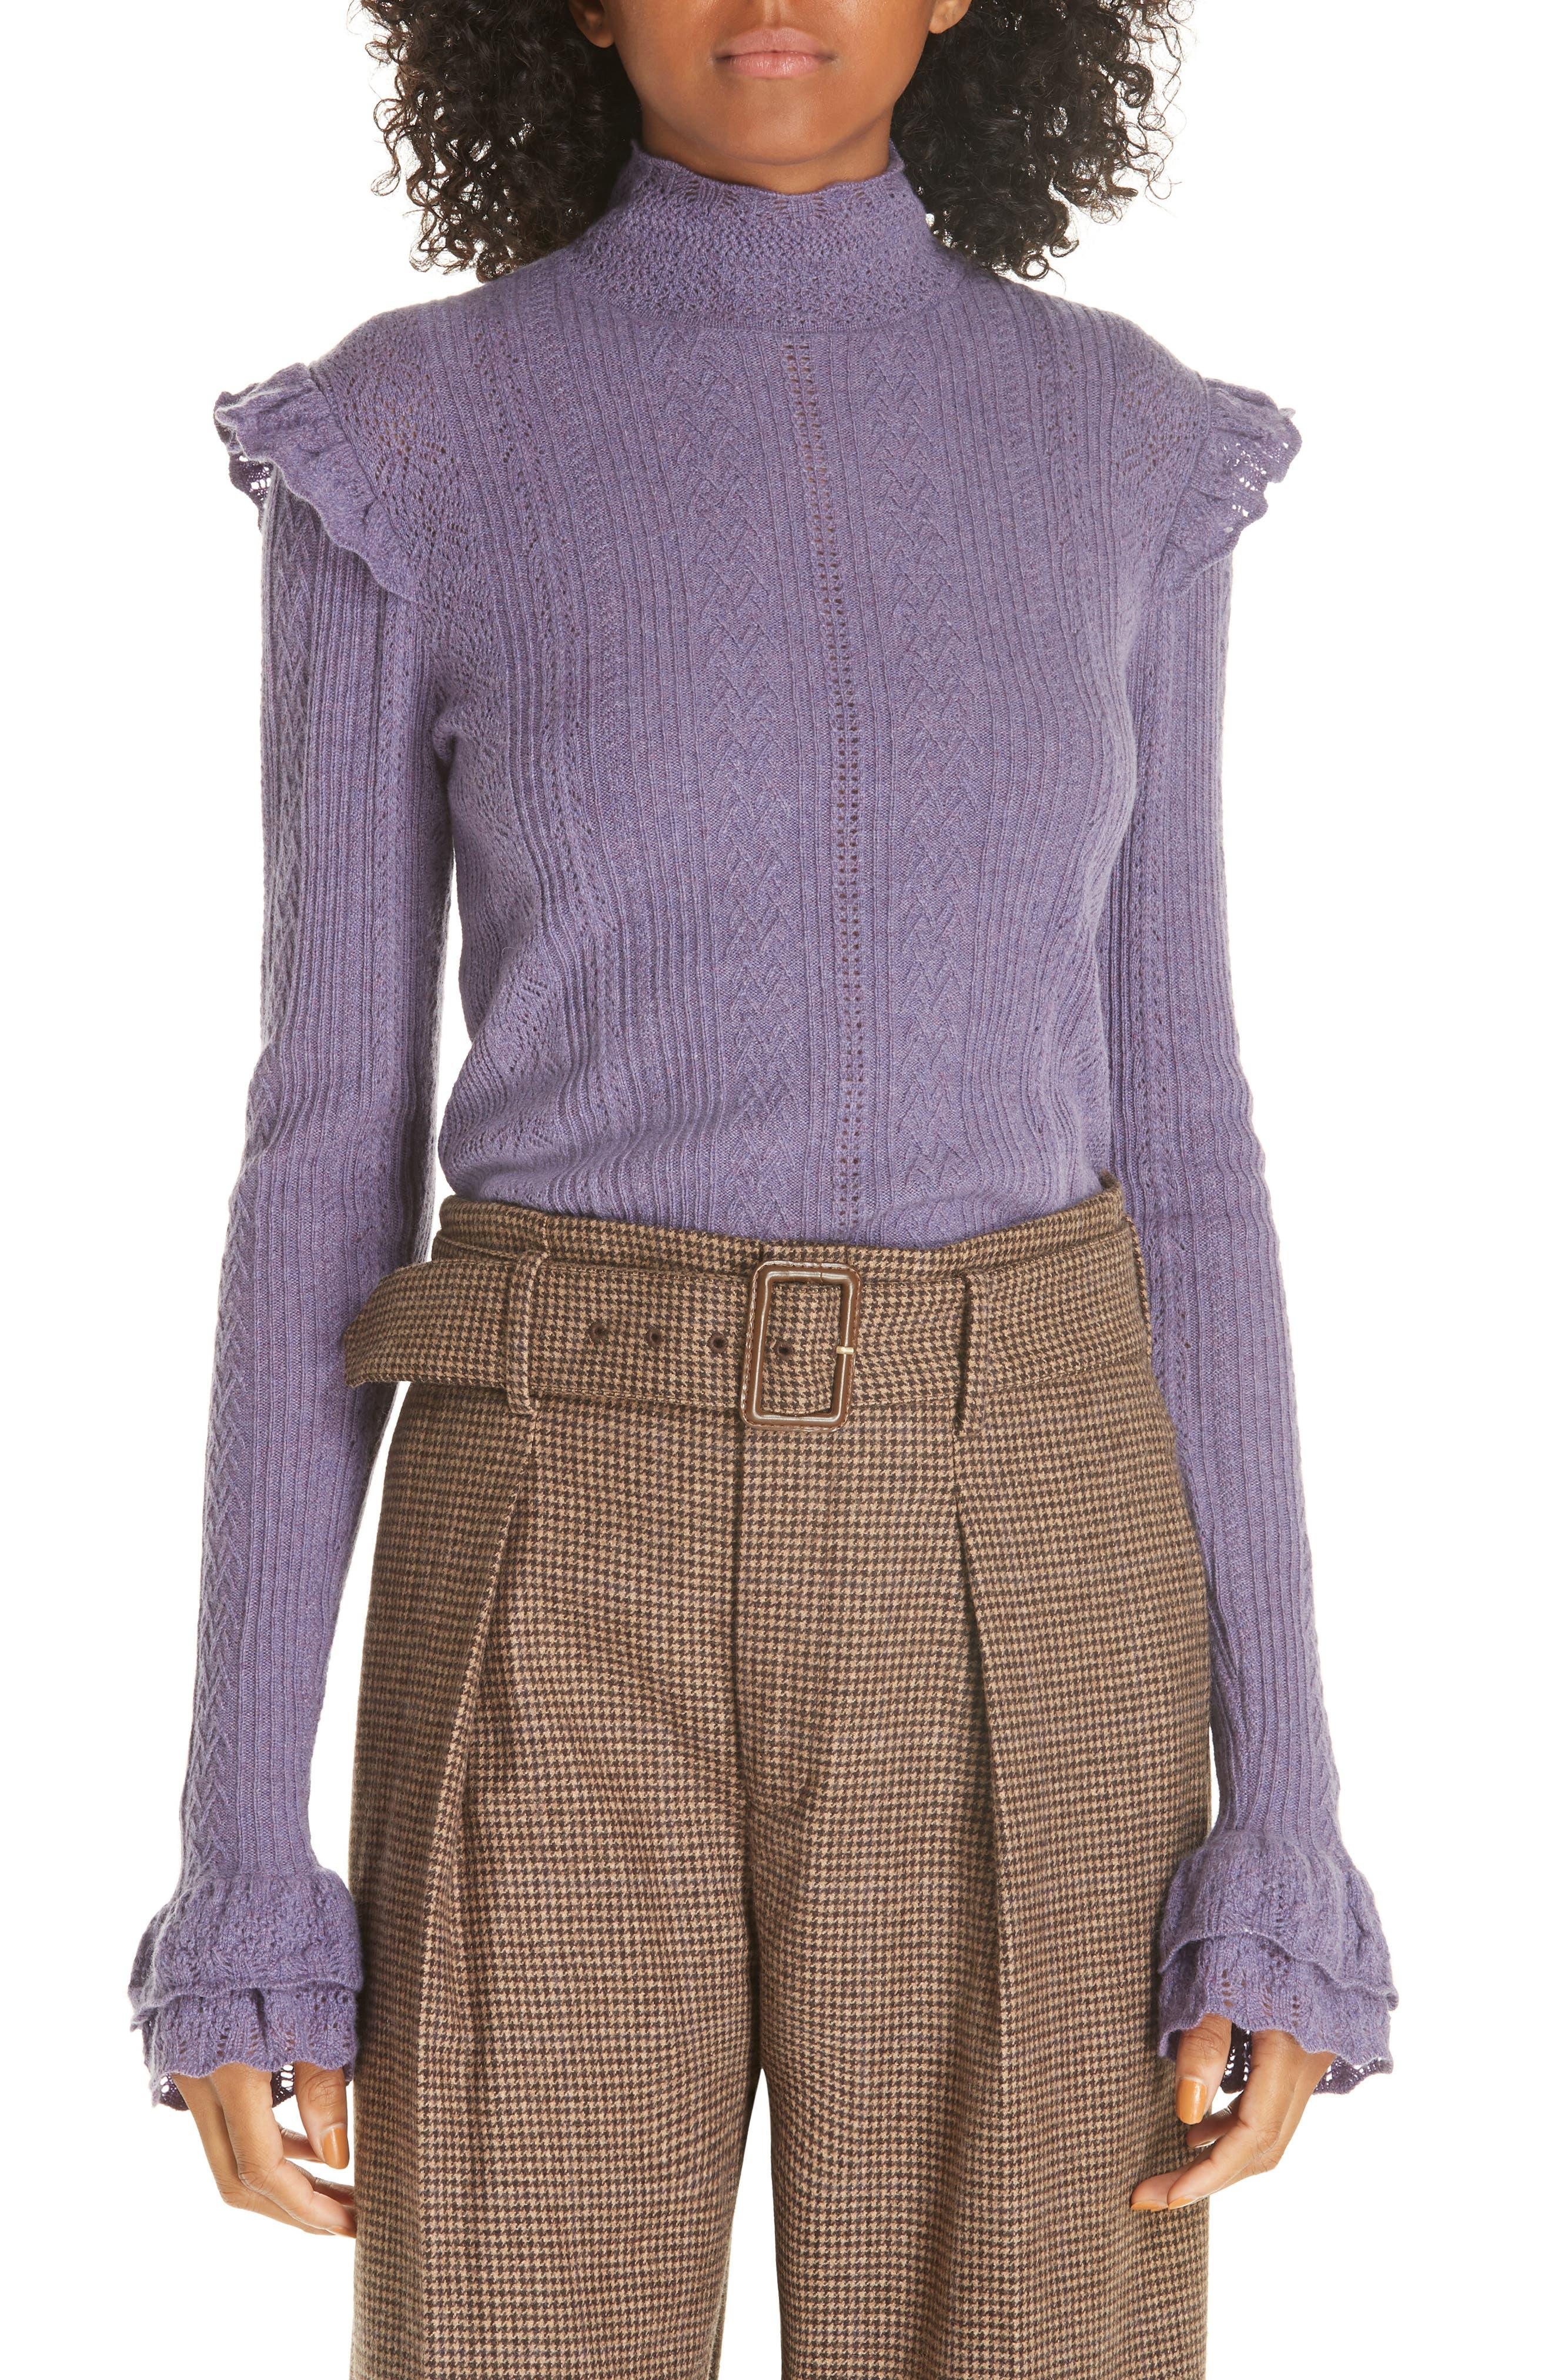 POLO RALPH LAUREN Ruffle Detail Pointelle Sweater, Main, color, 500